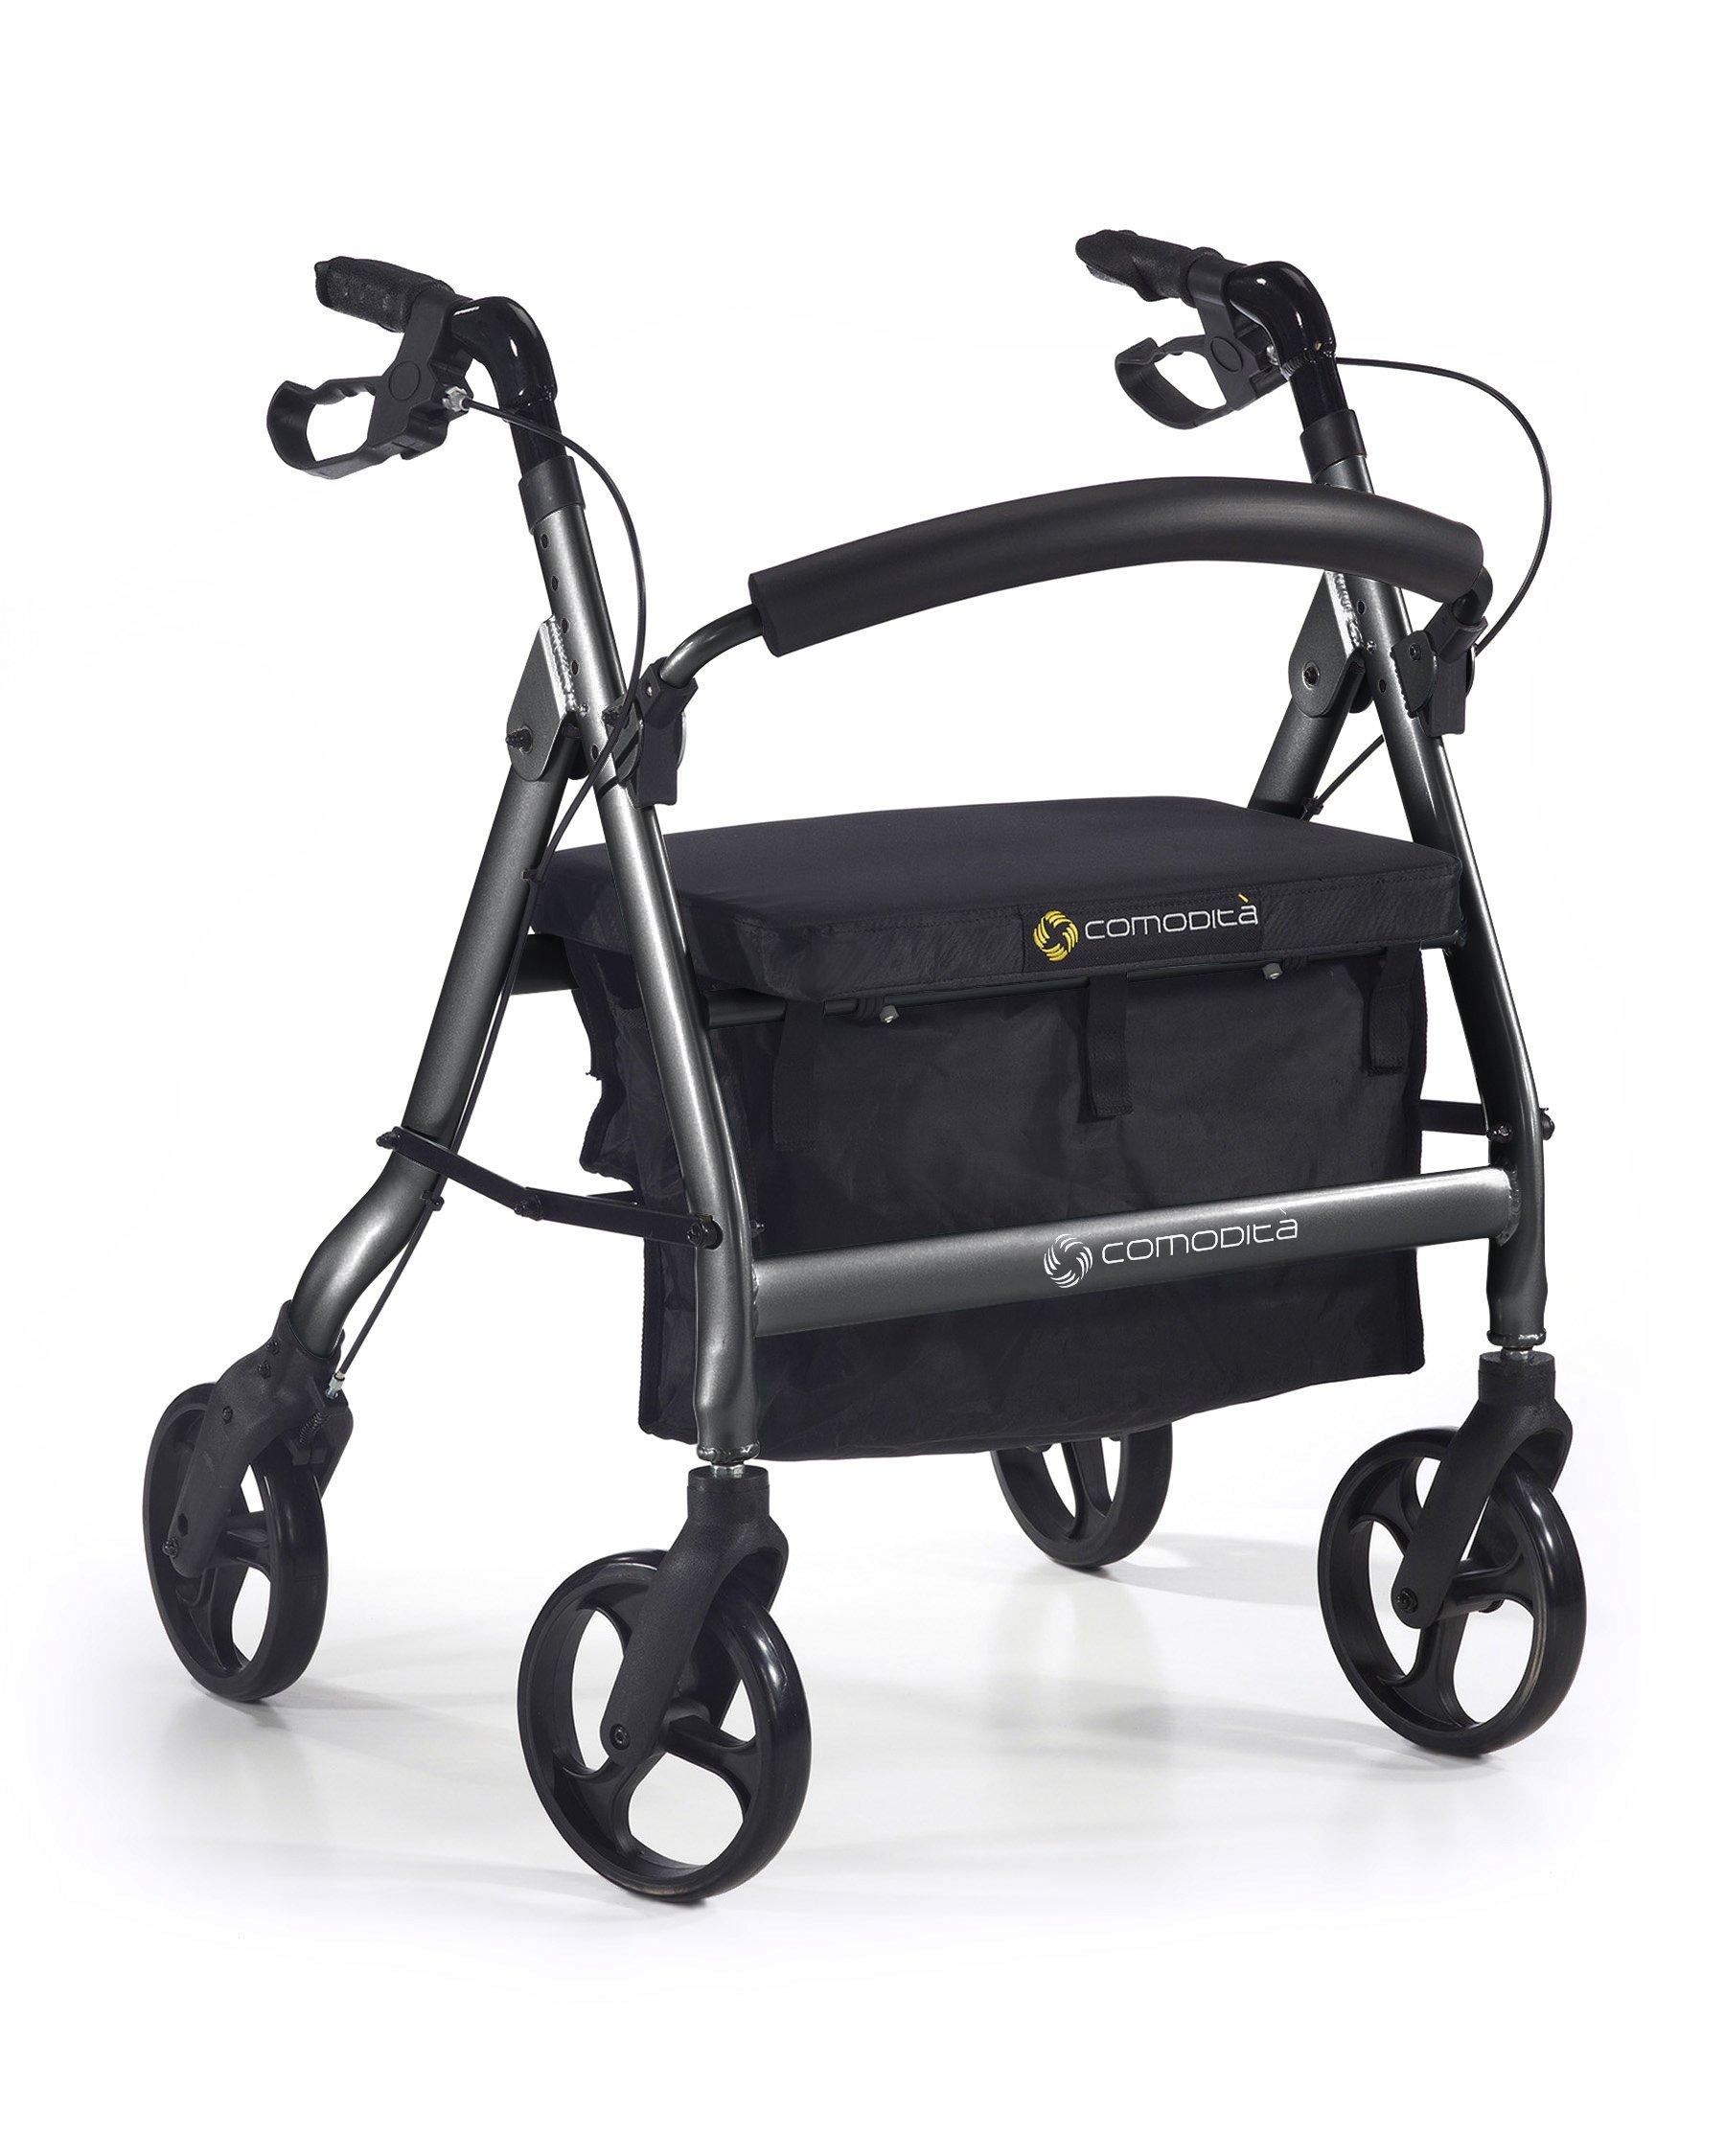 Comodità Spazio Extra Wide Heavy-Duty Rolling Walker - Rollator - with Comfortable 18'' Wide Seat (Metallic Graphite)